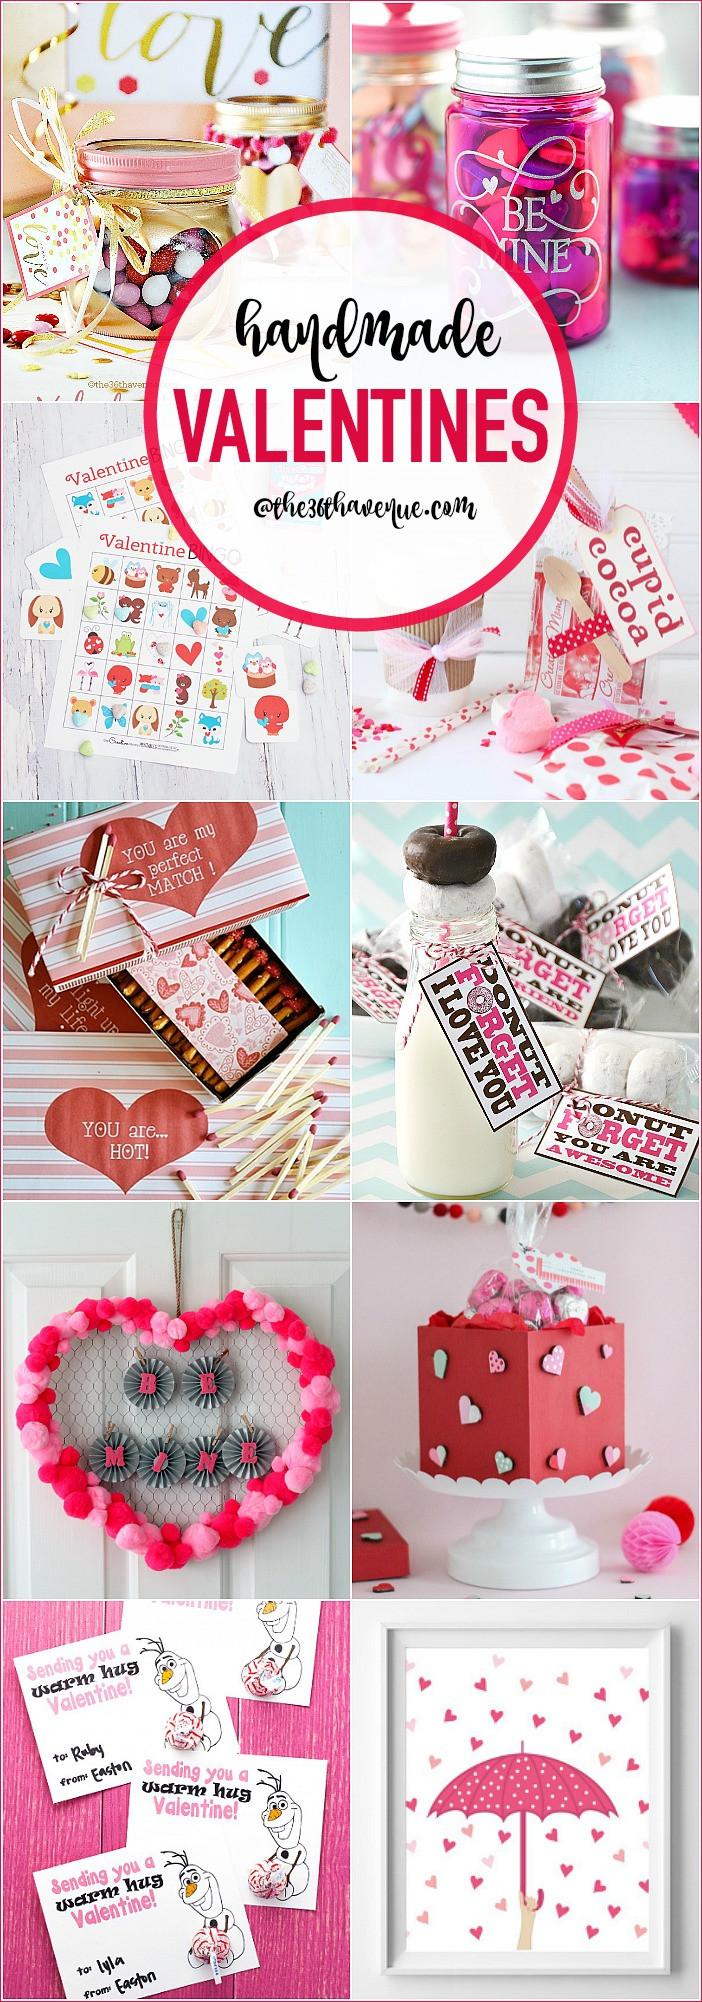 Valentine Day Homemade Gift Ideas  Handmade Valentines DIY Gift Ideas The 36th AVENUE